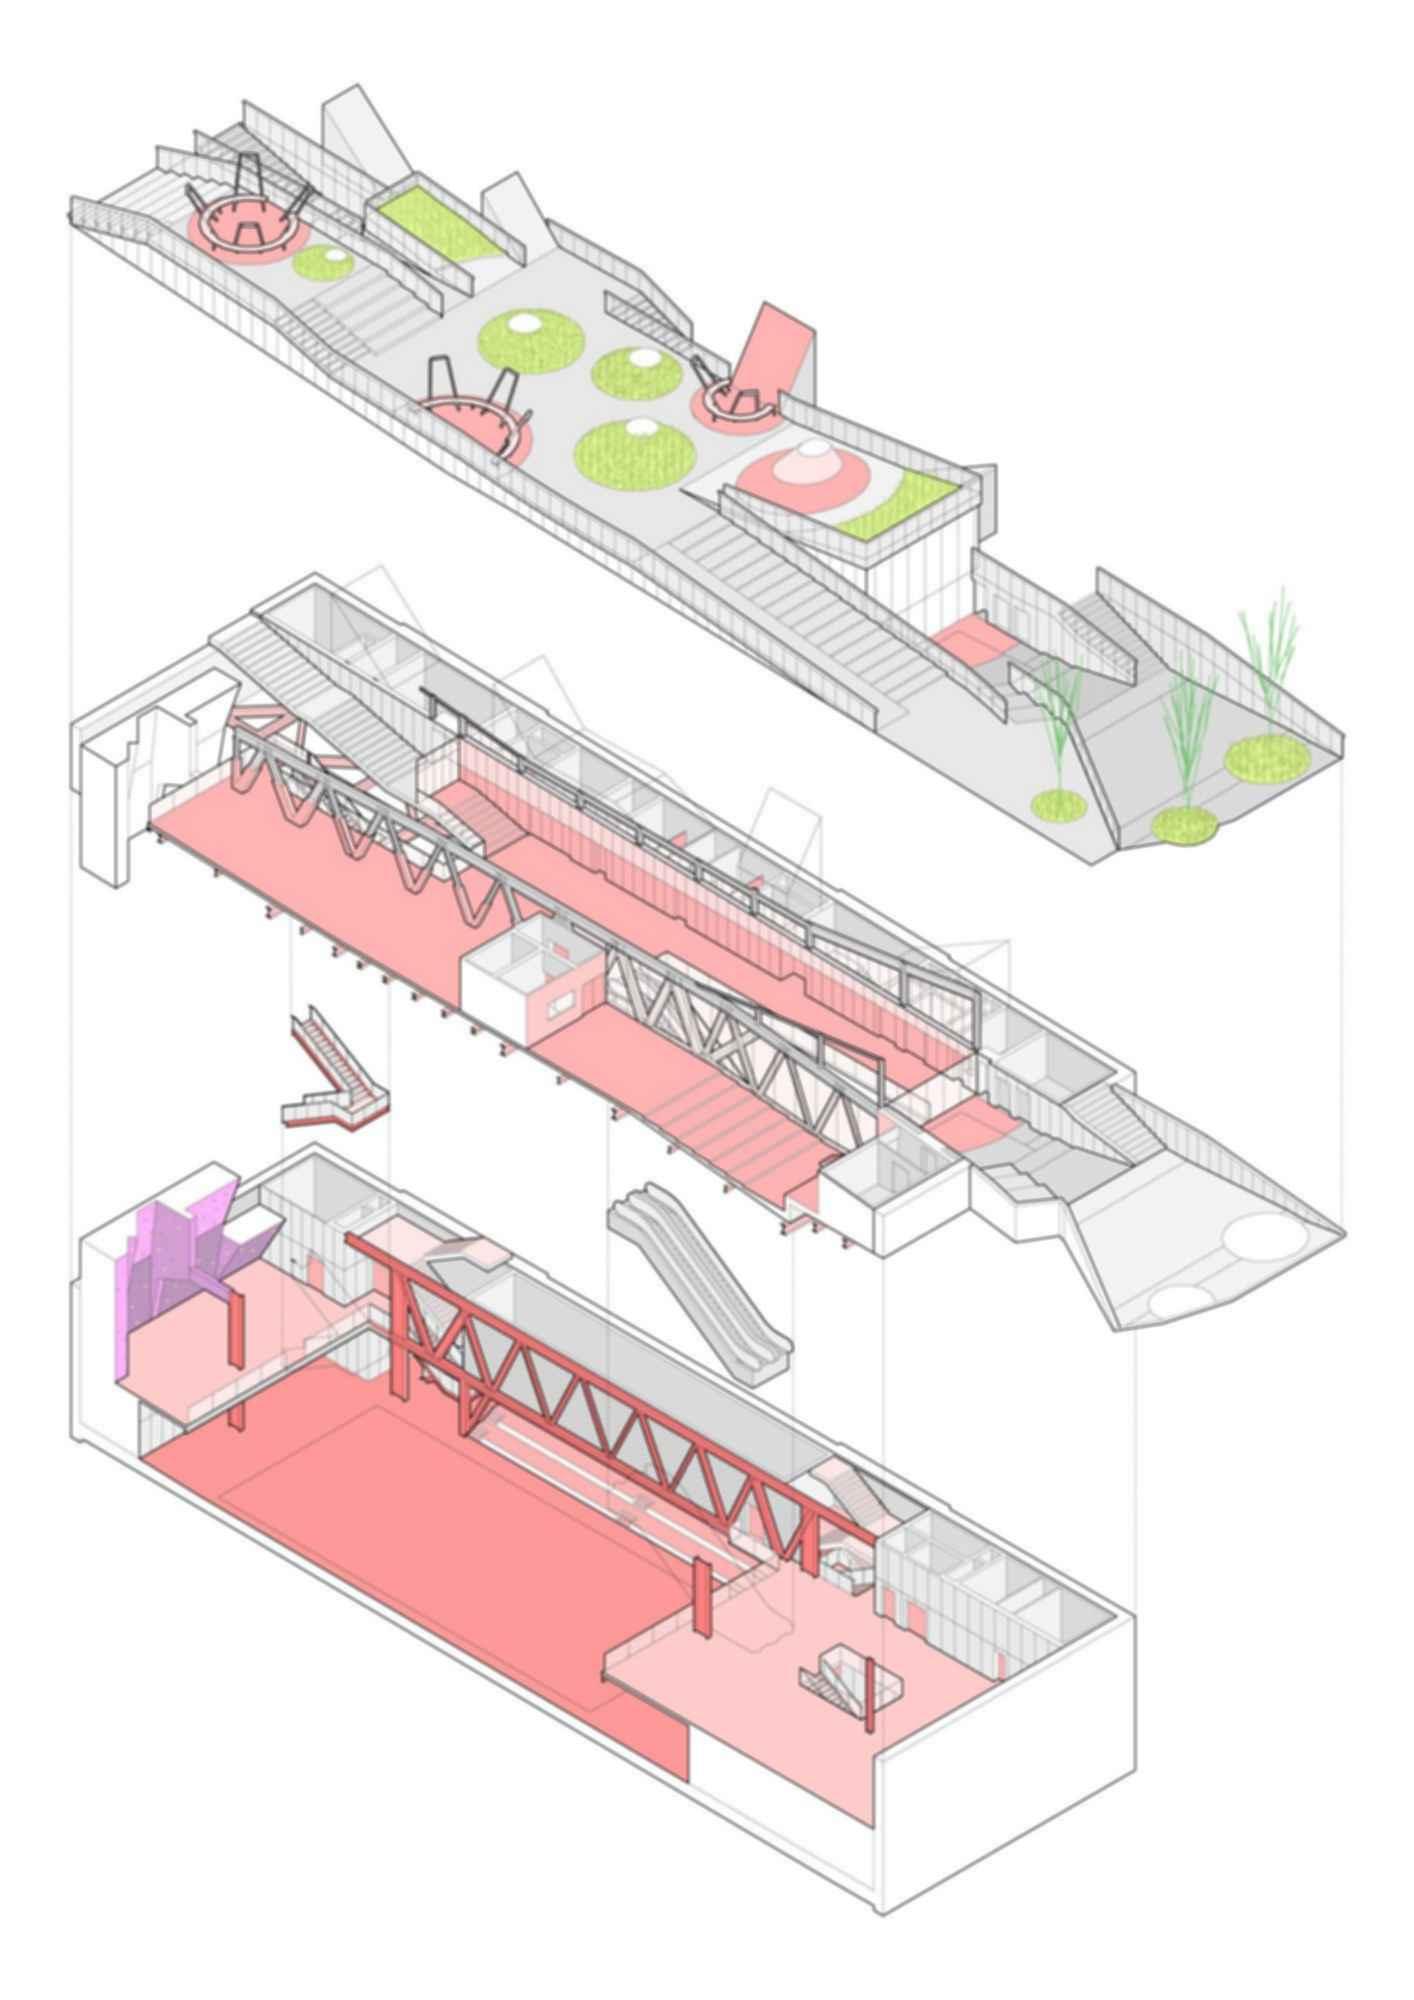 Teruel-zilla - Concept Design